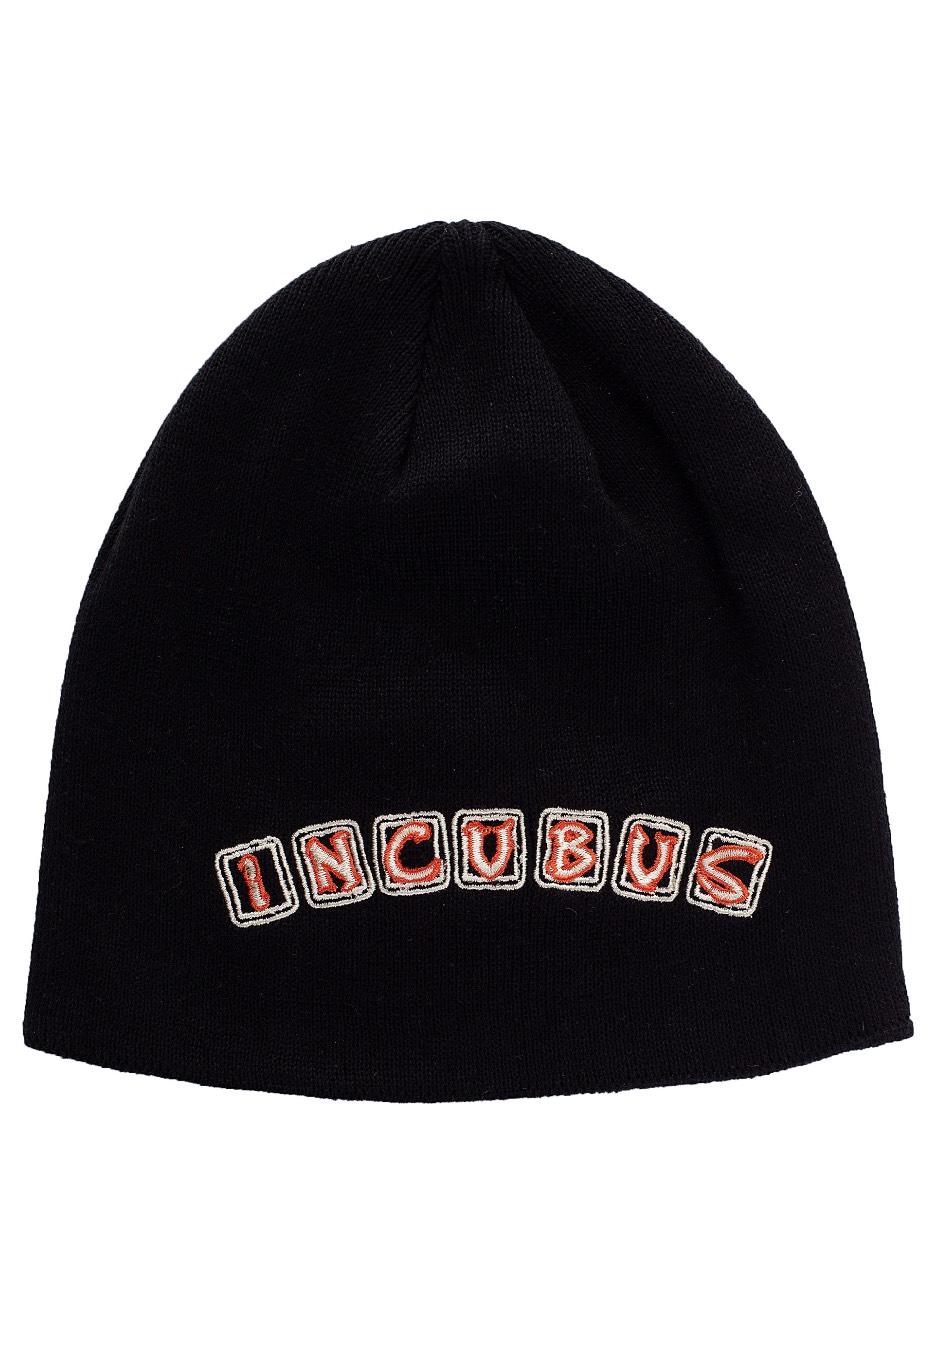 Incubus - Logo - Beanies